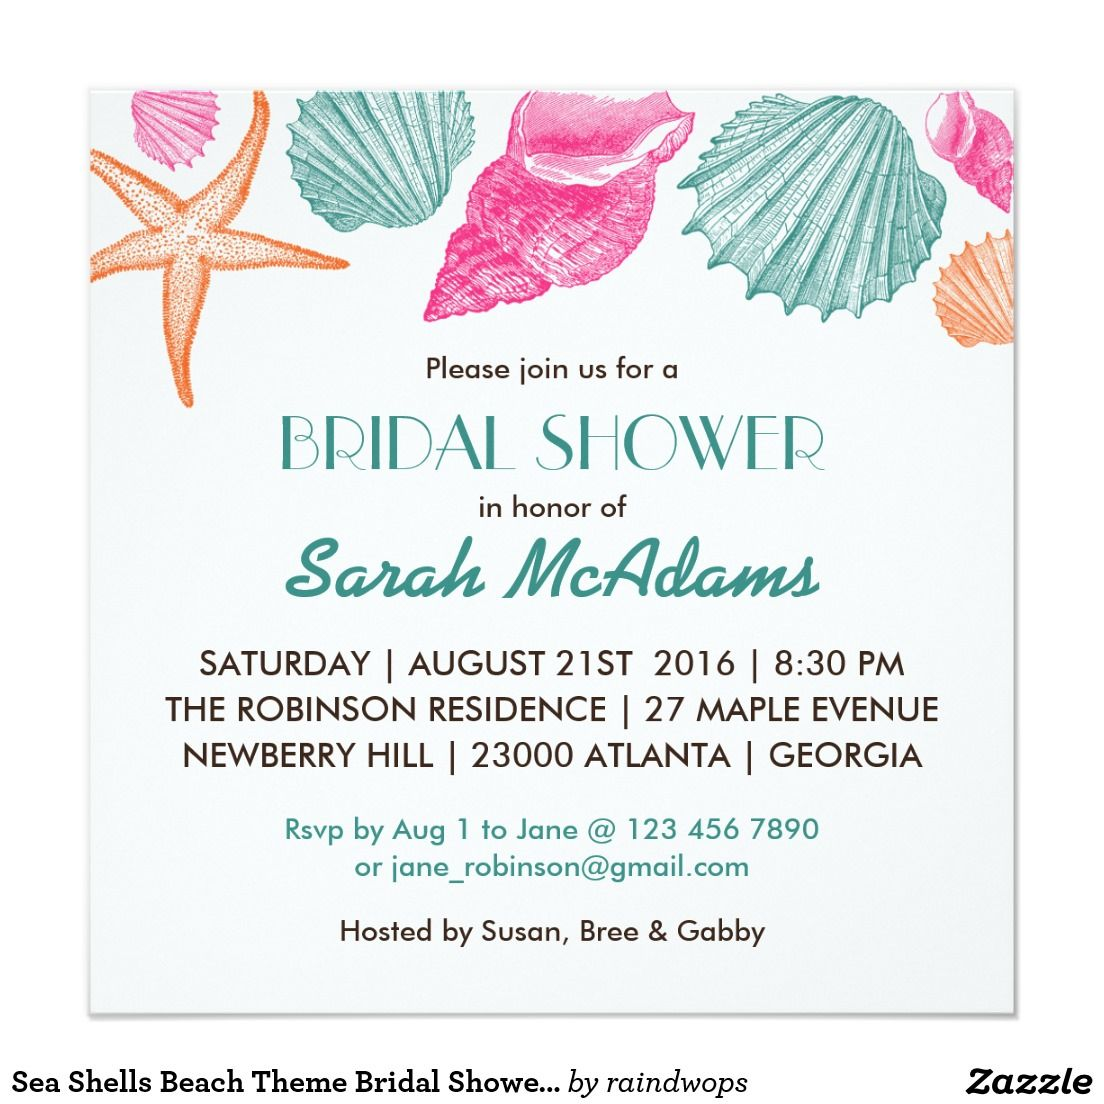 Gmail beach theme pictures - Sea Shells Beach Theme Bridal Shower Invitation